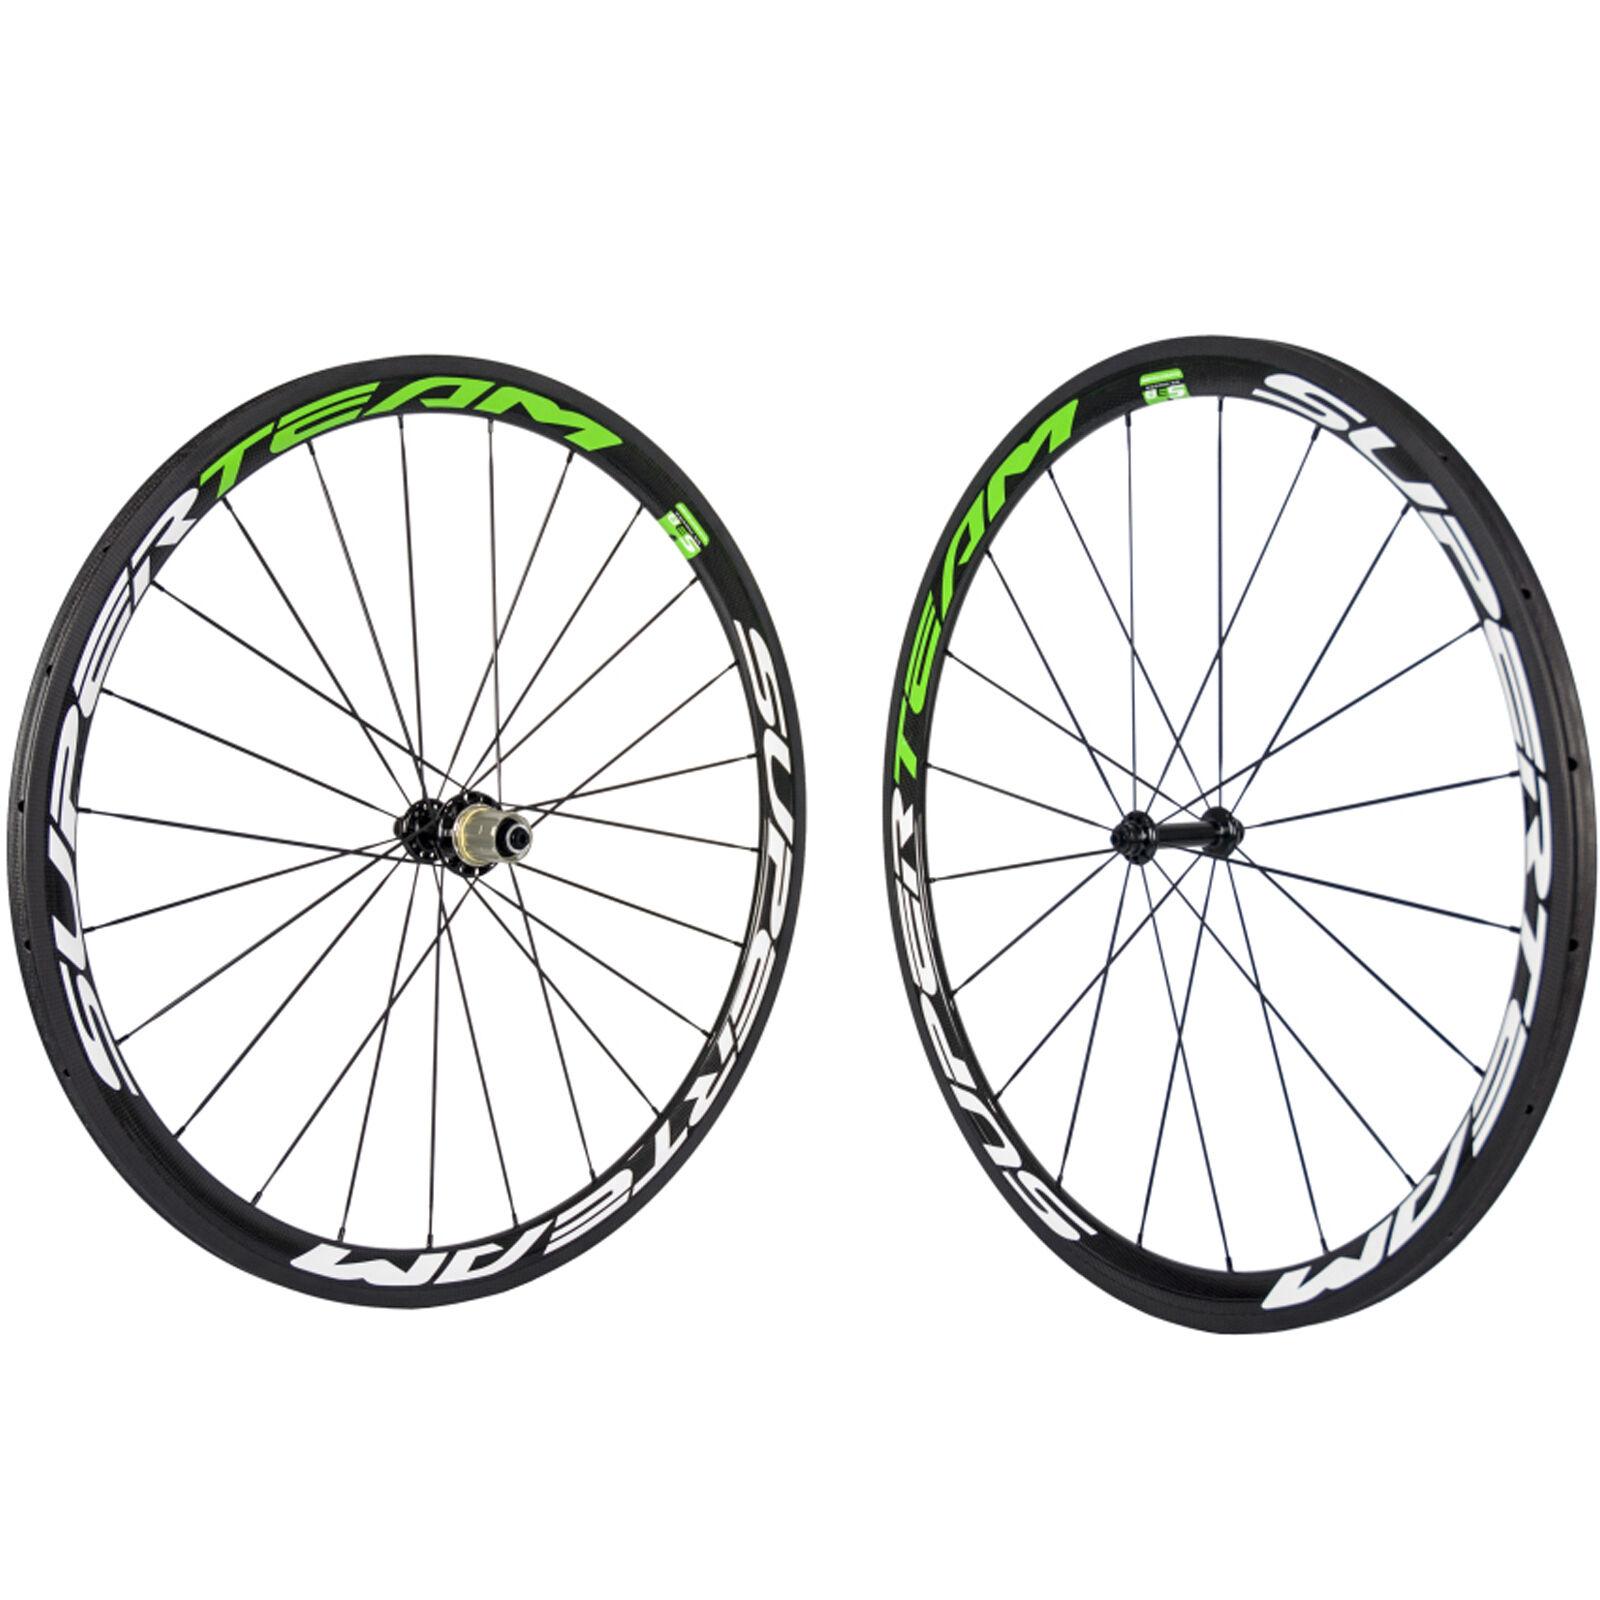 1 Set Of Road Bike Tubular Carbon Wheels R39 Glossy 38mm Carbon Bicycle Wheelset